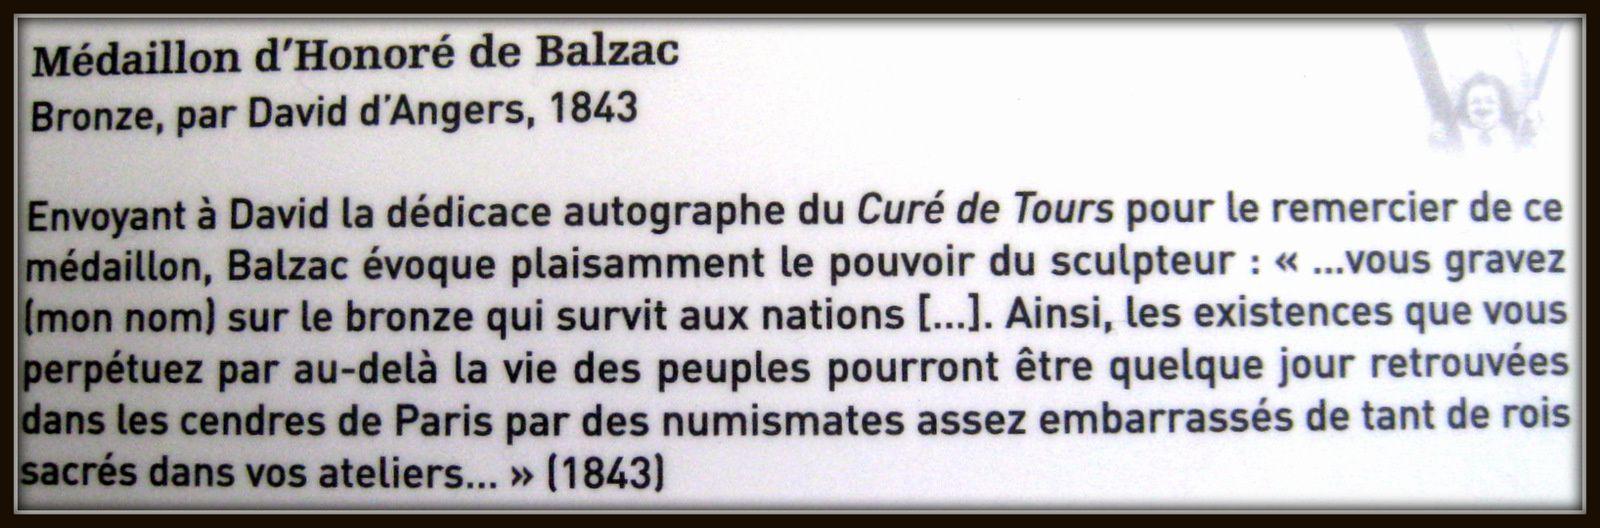 David d'Angers, Médaillon d'Honoré de Balzac